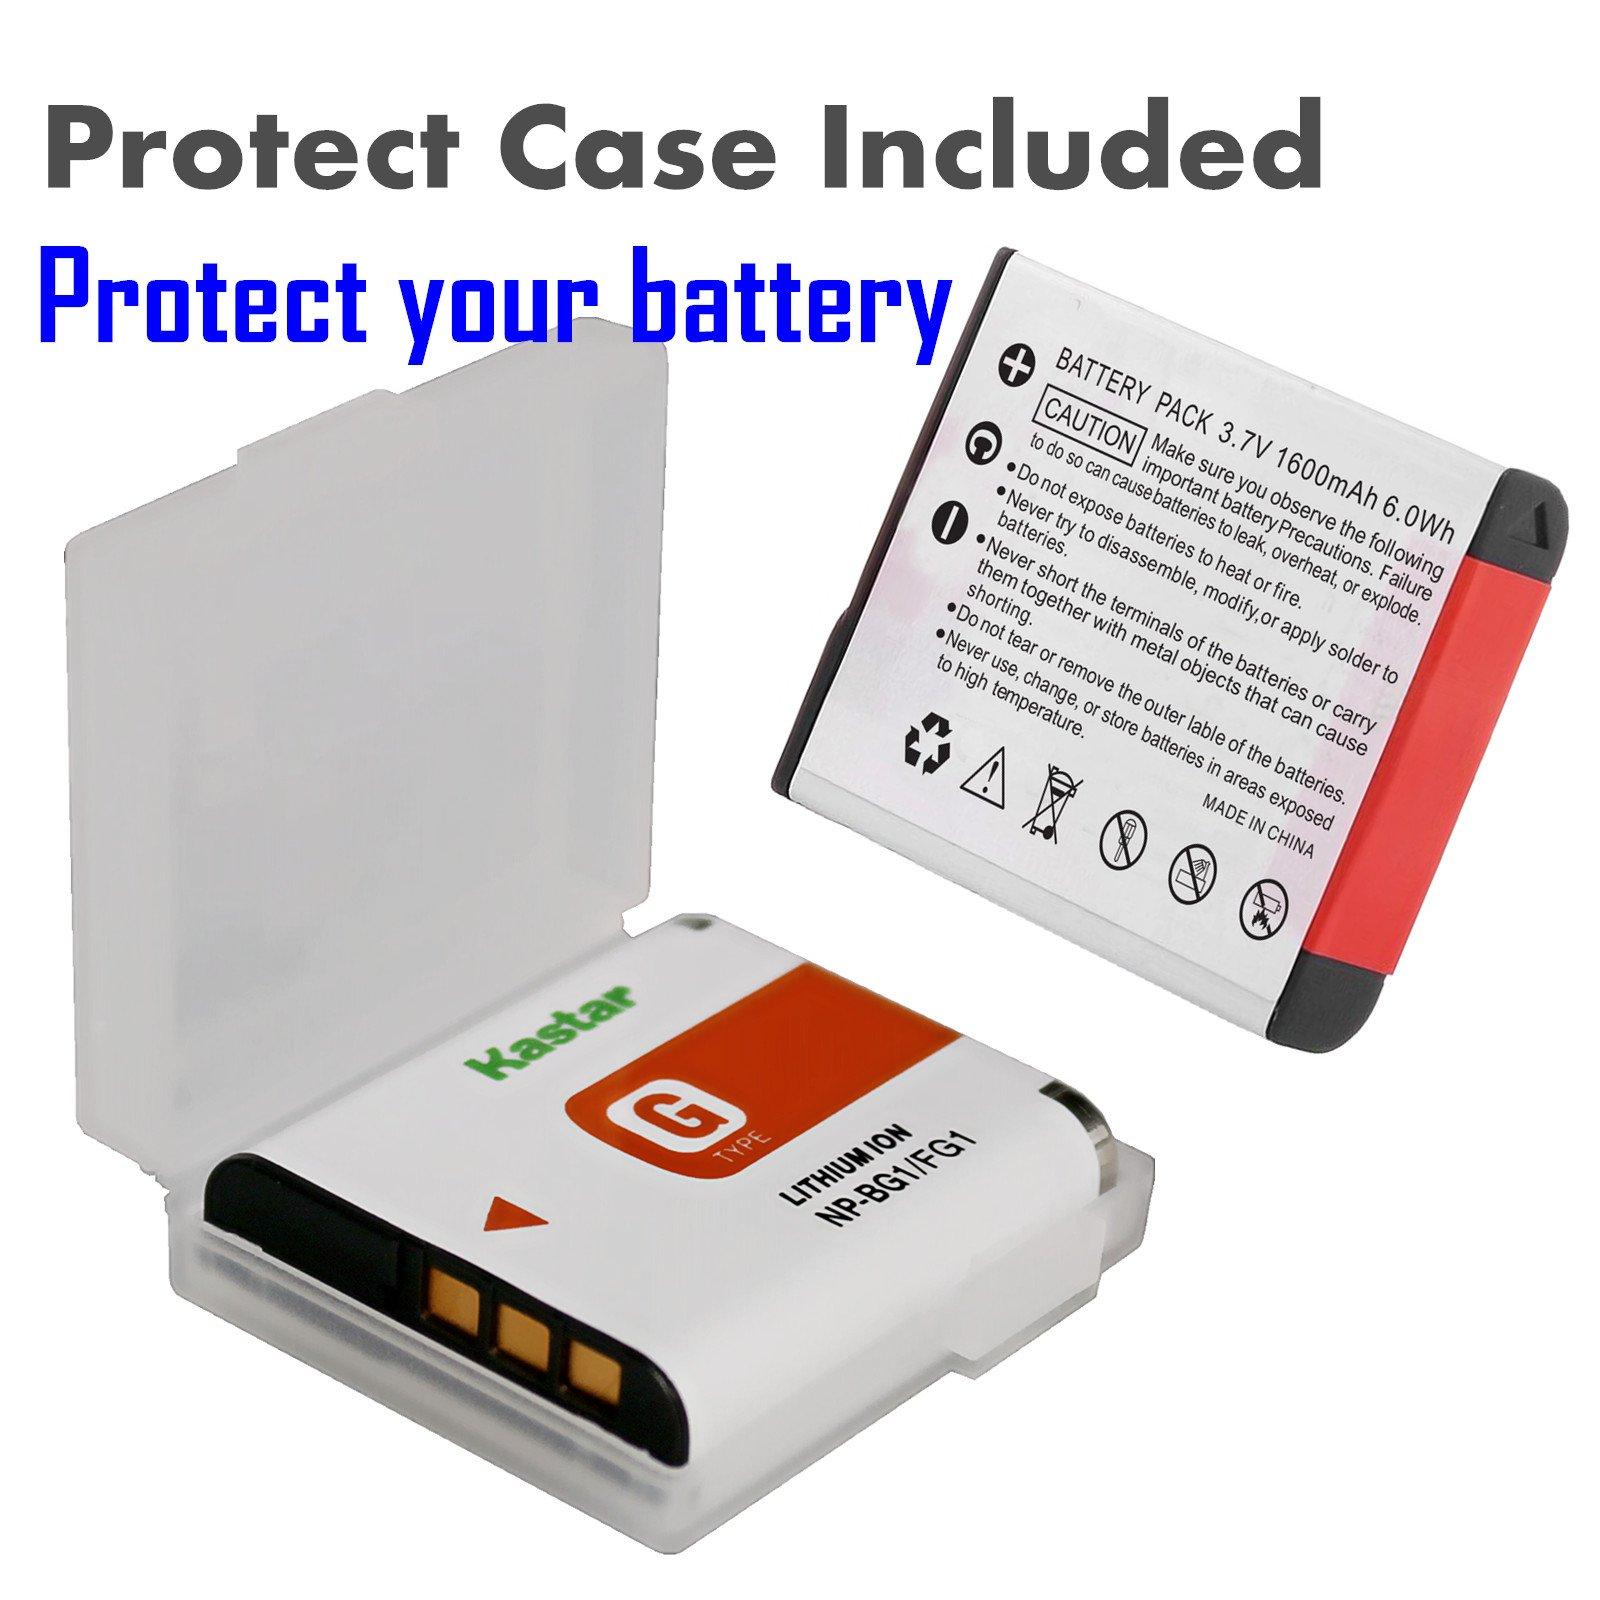 Kastar Battery (X2) & LCD Slim USB Charger for Sony NP-BG1 NPBG1 NP-FG1 NPFG1 and Cyber-shot DSC-W120 W150 W220 DSC-H3 H7 H9 H10 H20 H50 H55 H70 DSC-HX5V DSC-HX7V DSC-HX9V DSC-HX10V DSC-HX30V by Kastar (Image #6)